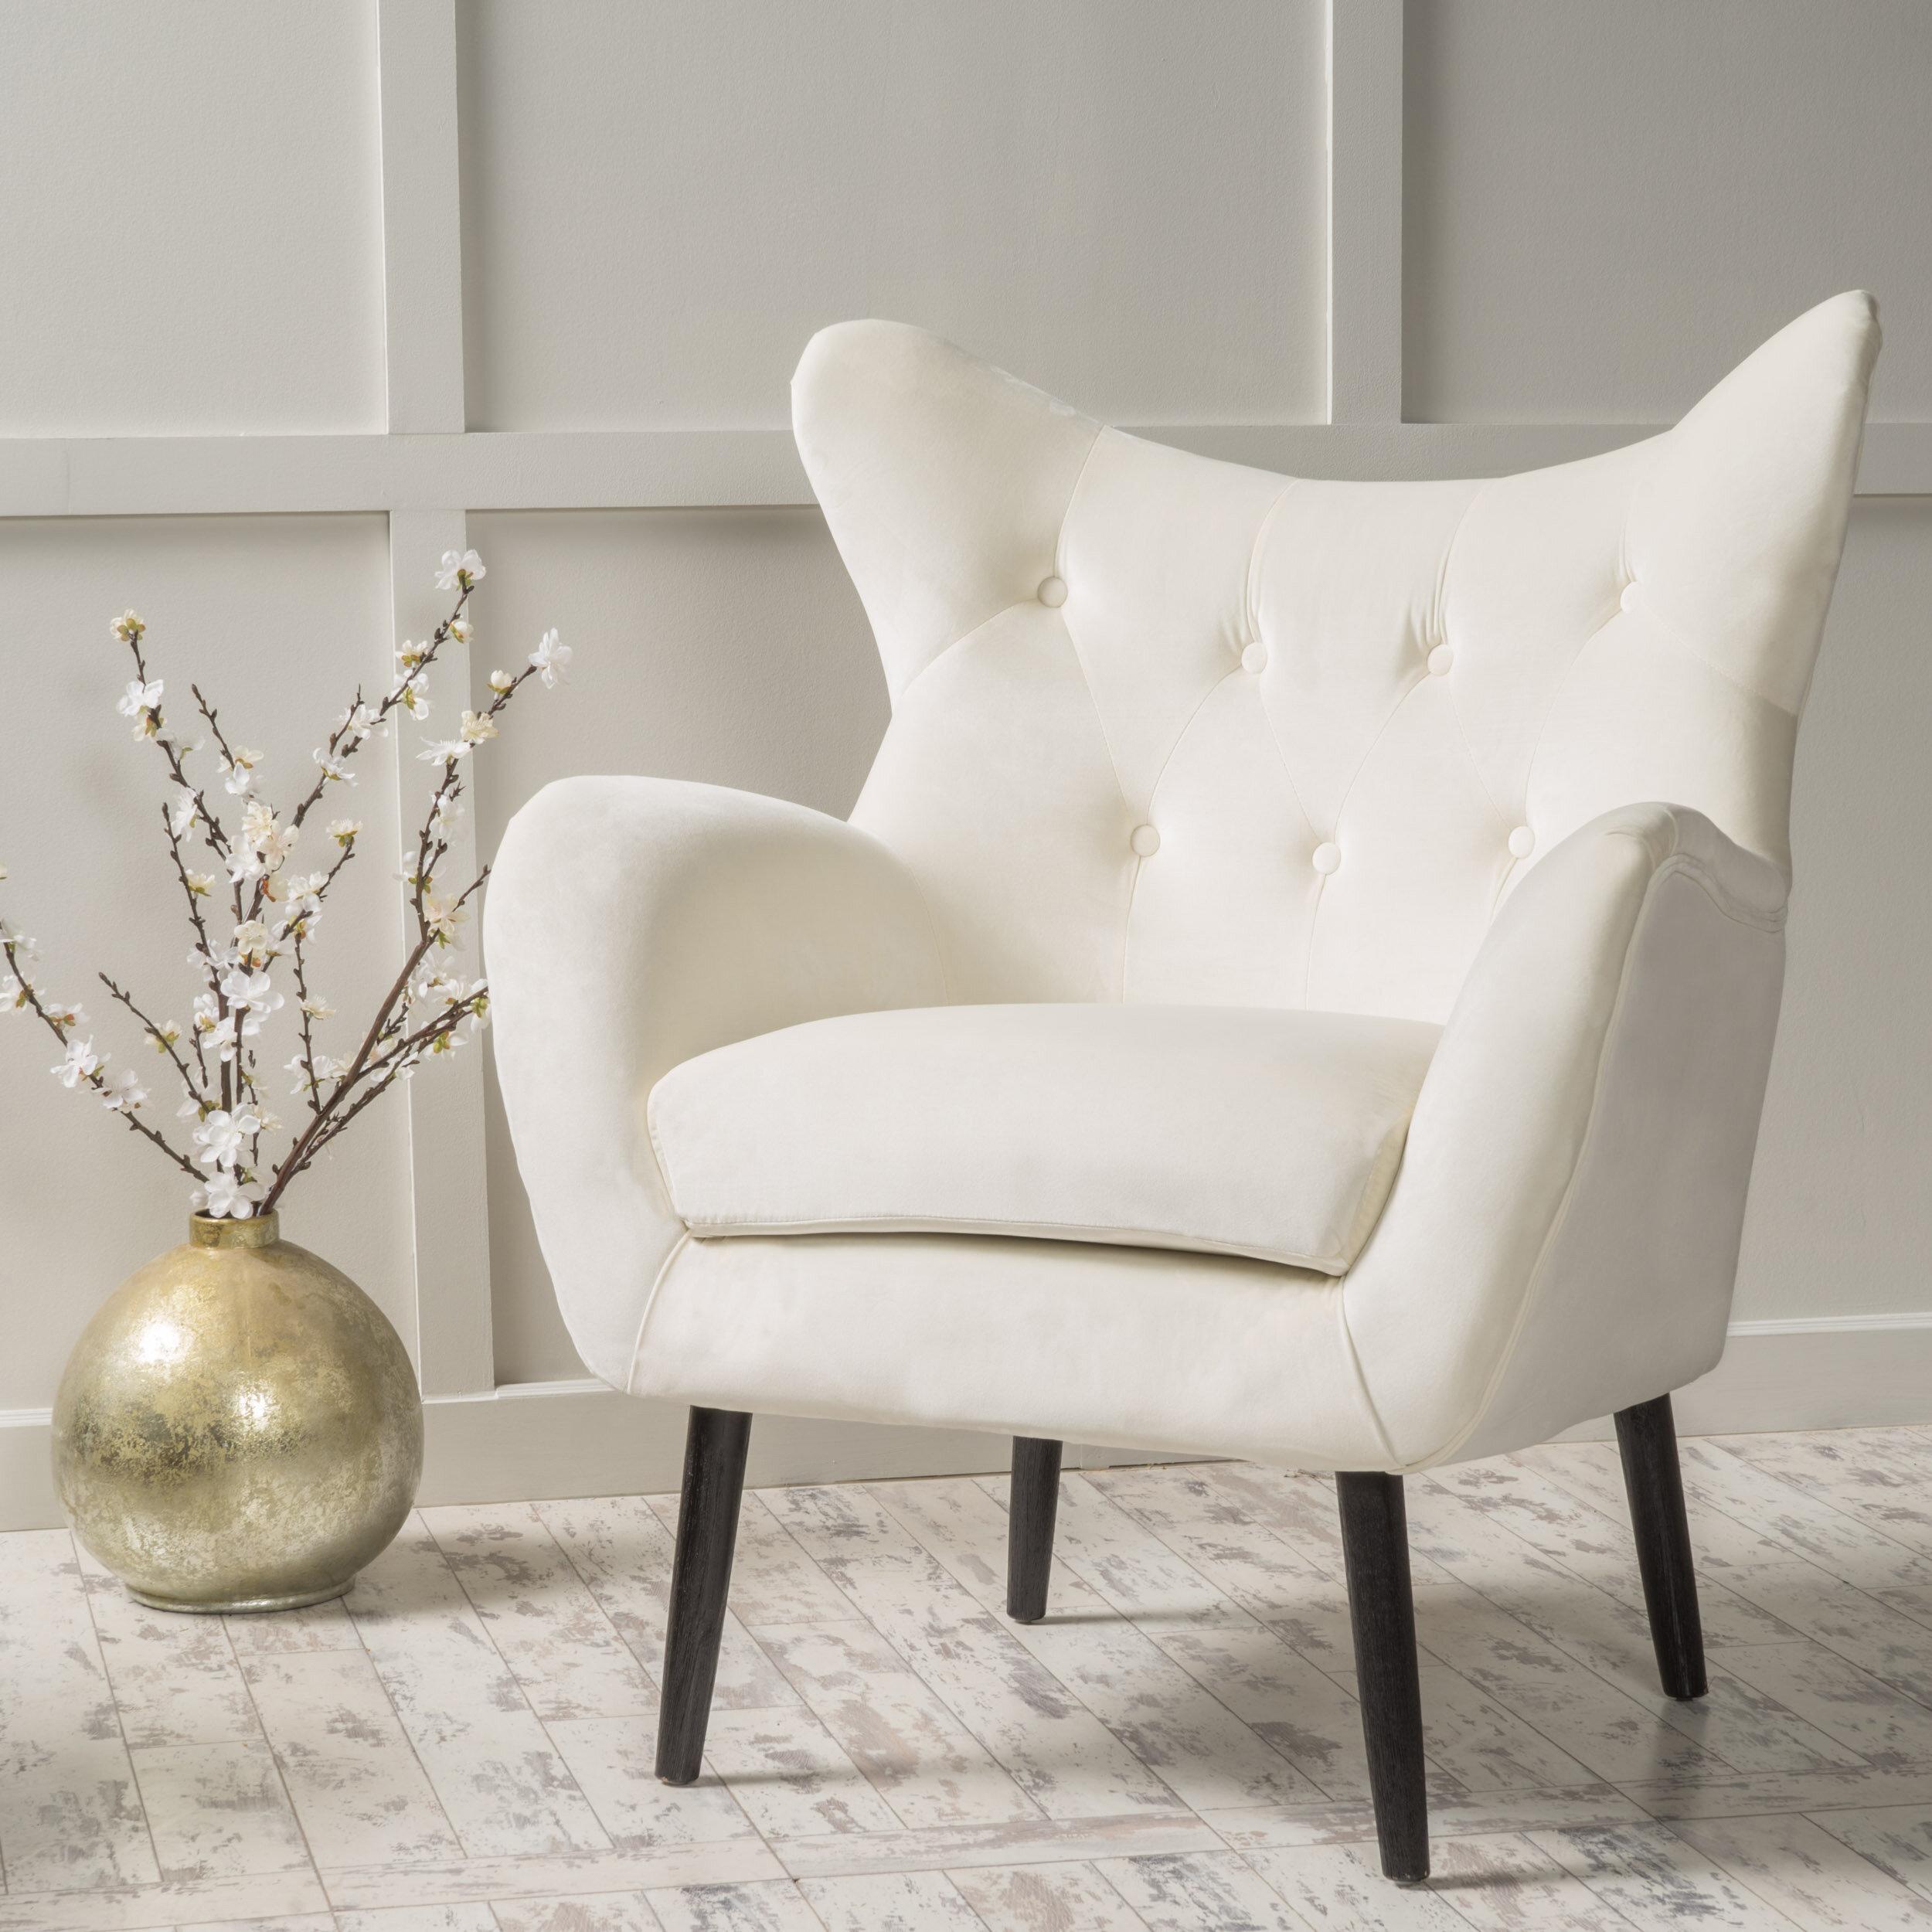 Willa Arlo Interiors Bouck 21 Wingback Chair Reviews Wayfair Ca